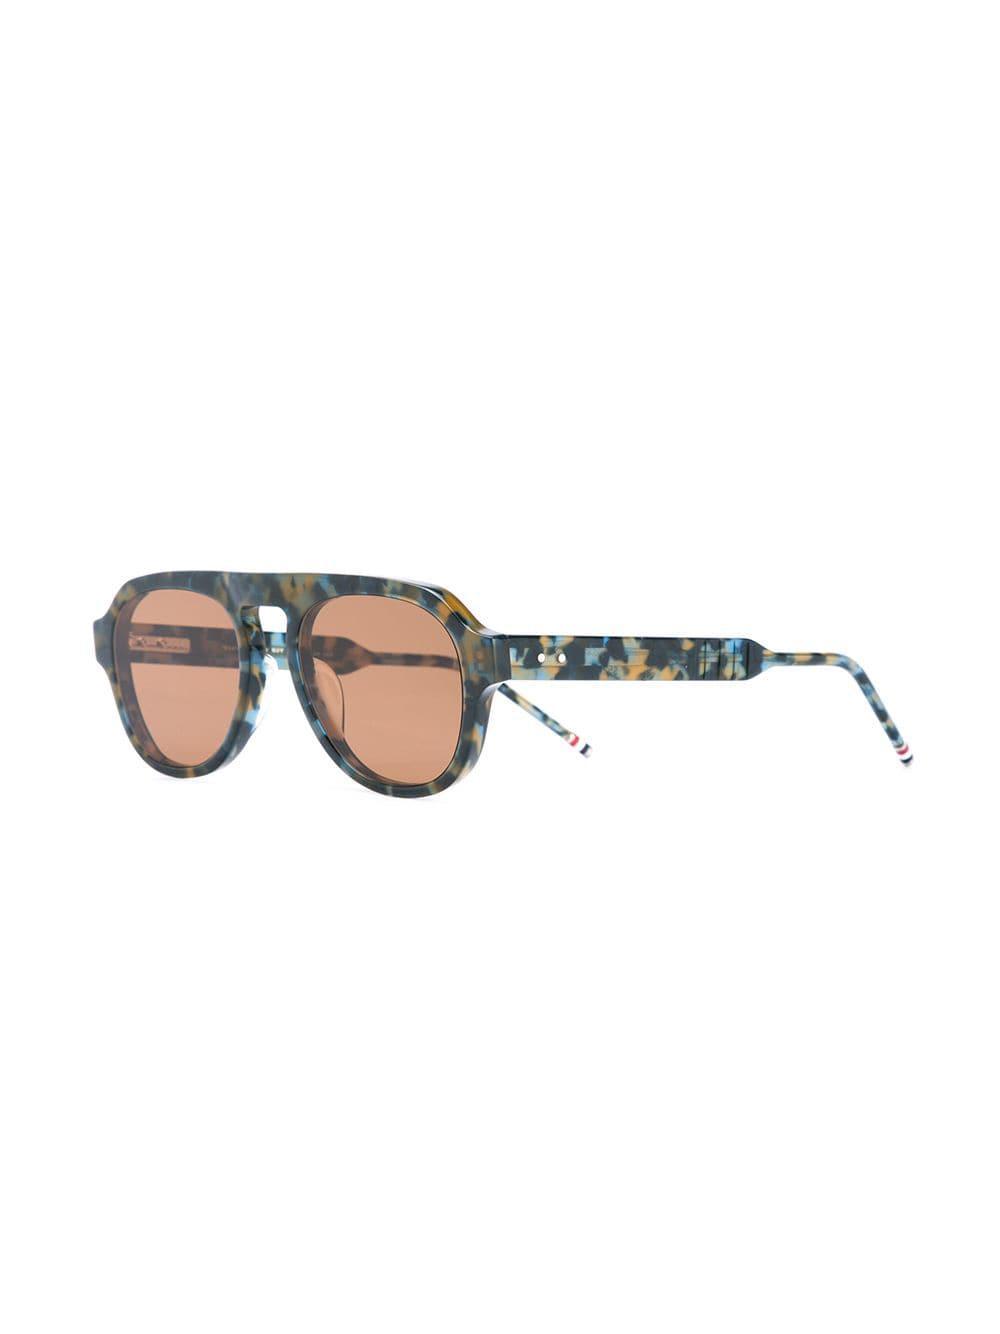 8724a654a6a5 Thom Browne Tortoiseshell Aviator Sunglasses in Blue for Men - Lyst